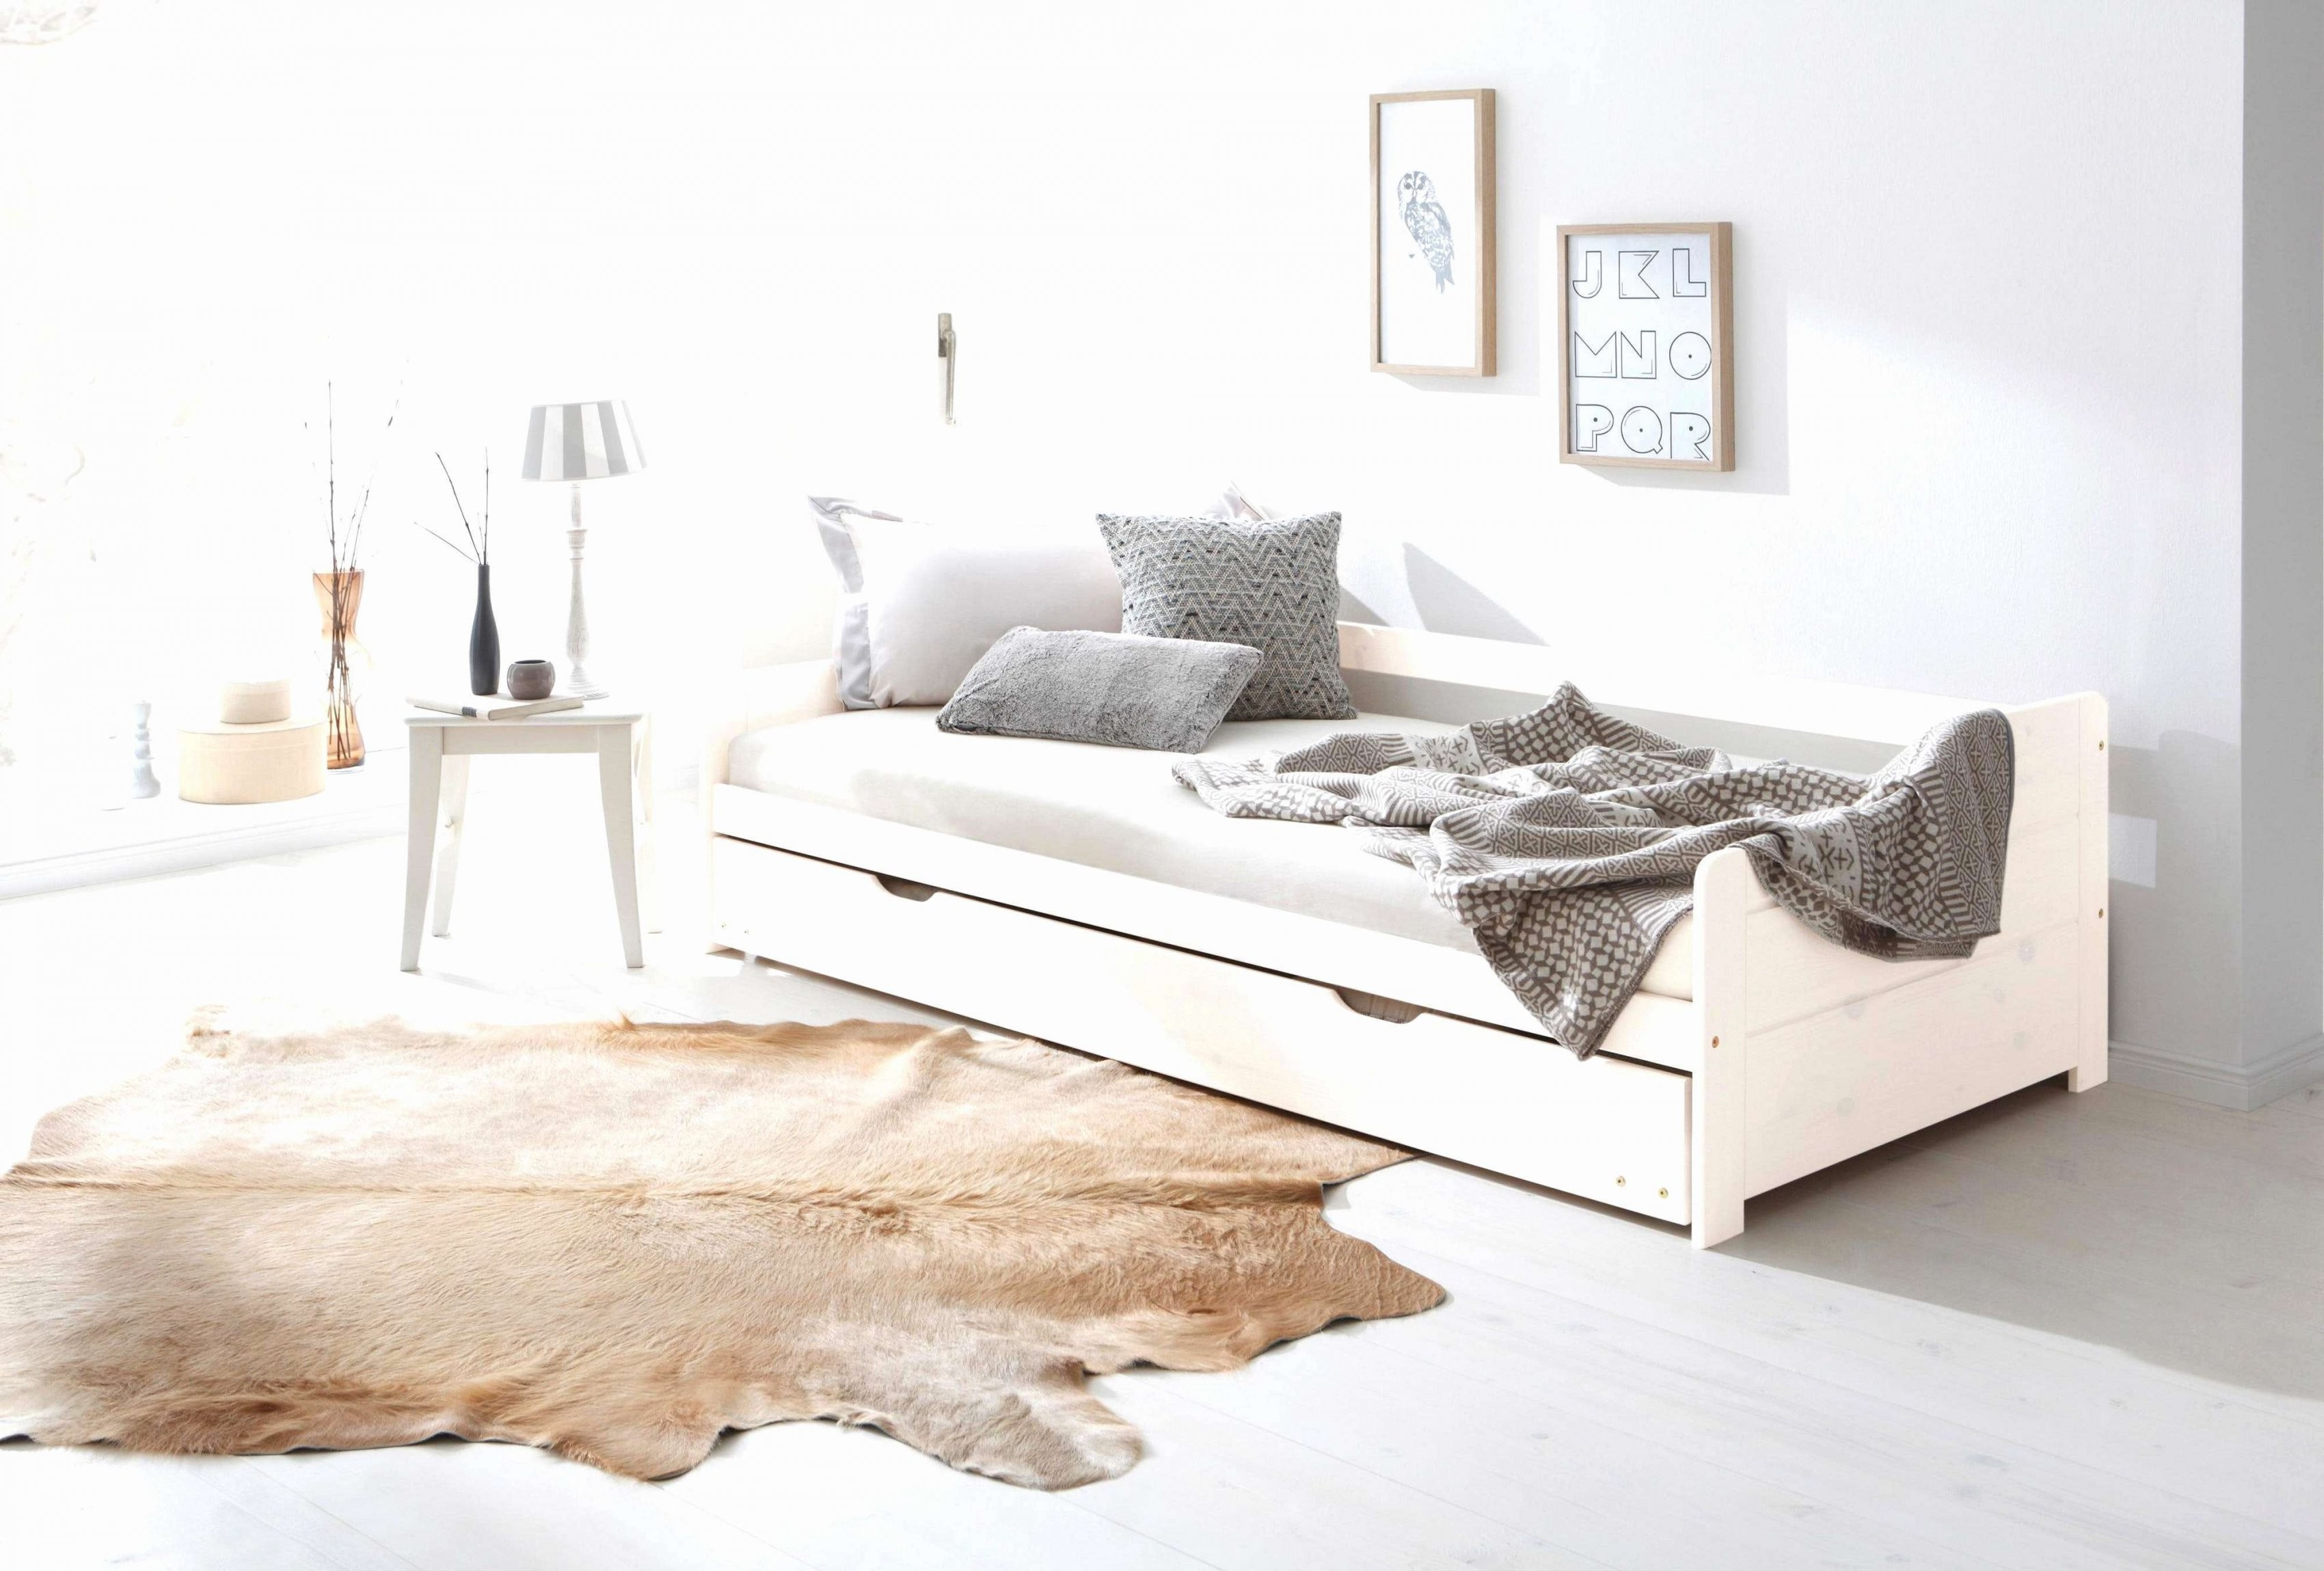 Dänisches Bettenlager Betten Beautiful Jugendbett Mit Ausziehbett von Bett Mit Ausziehbett Und Schubladen Photo